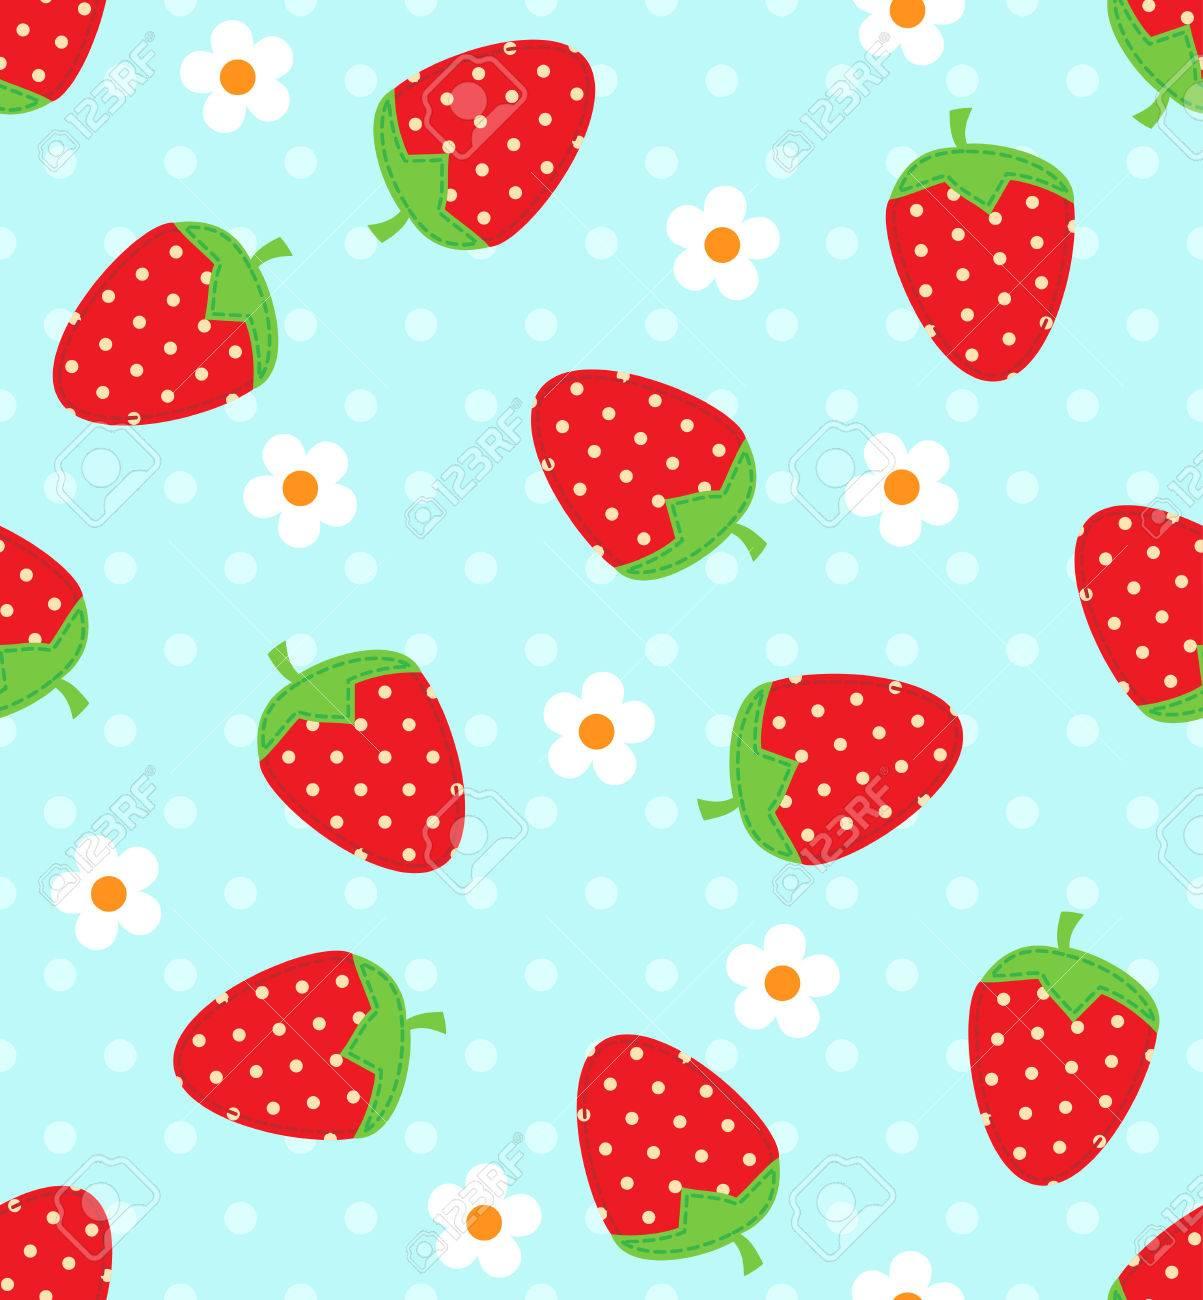 Seamless vector strawberry pattern - 42068584